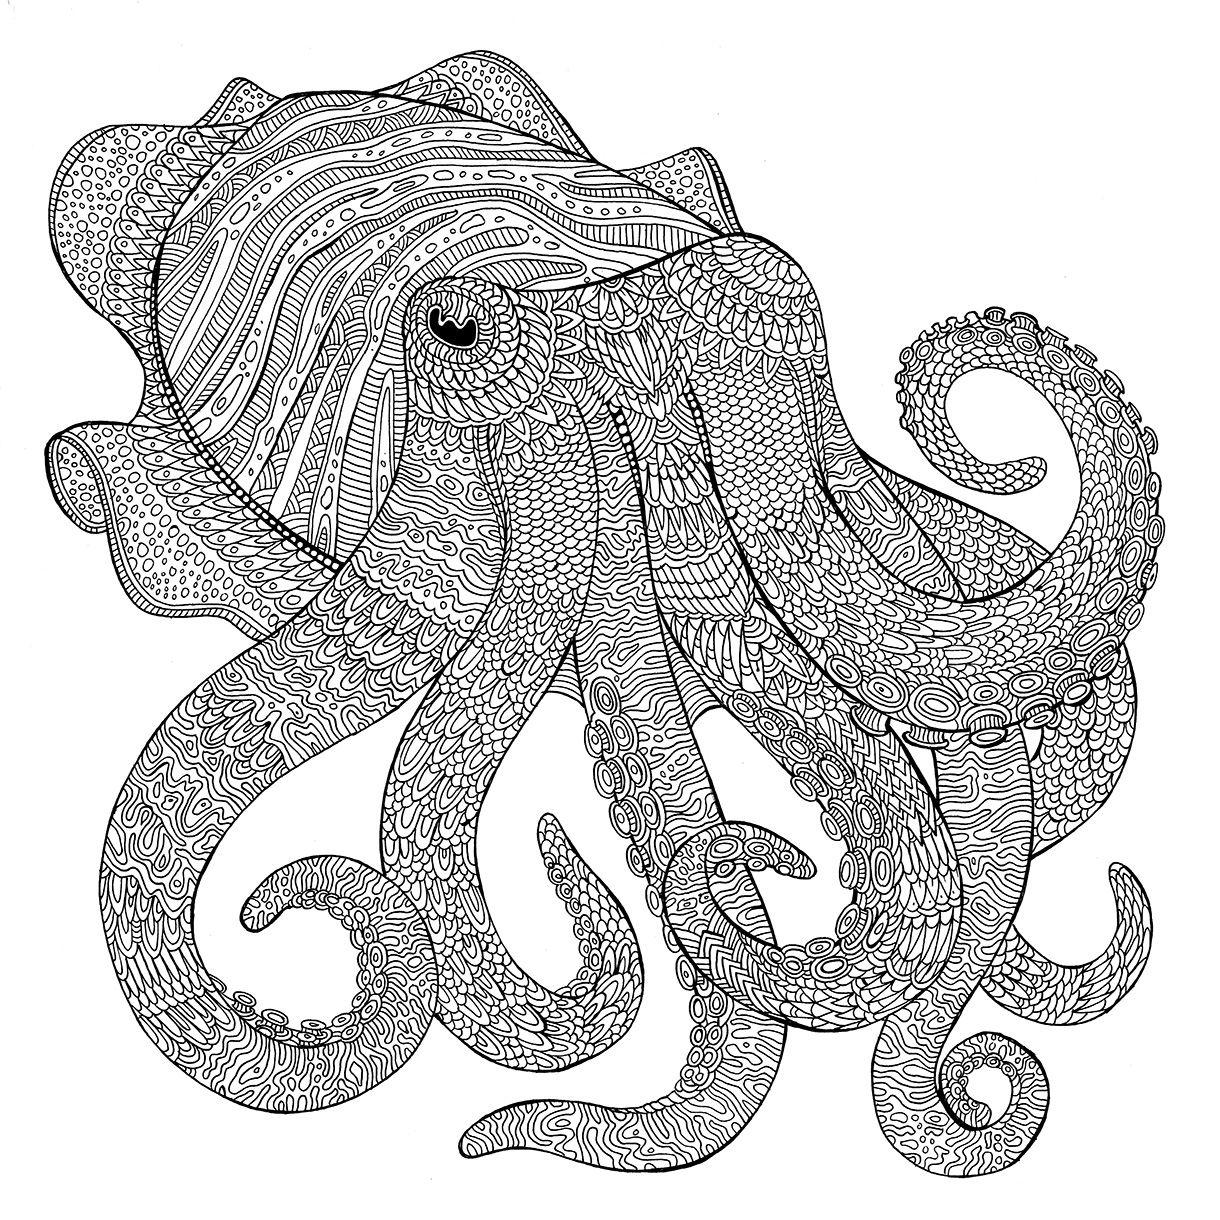 The Aquarium Colouring Book Cuttlefish Richard Merritt